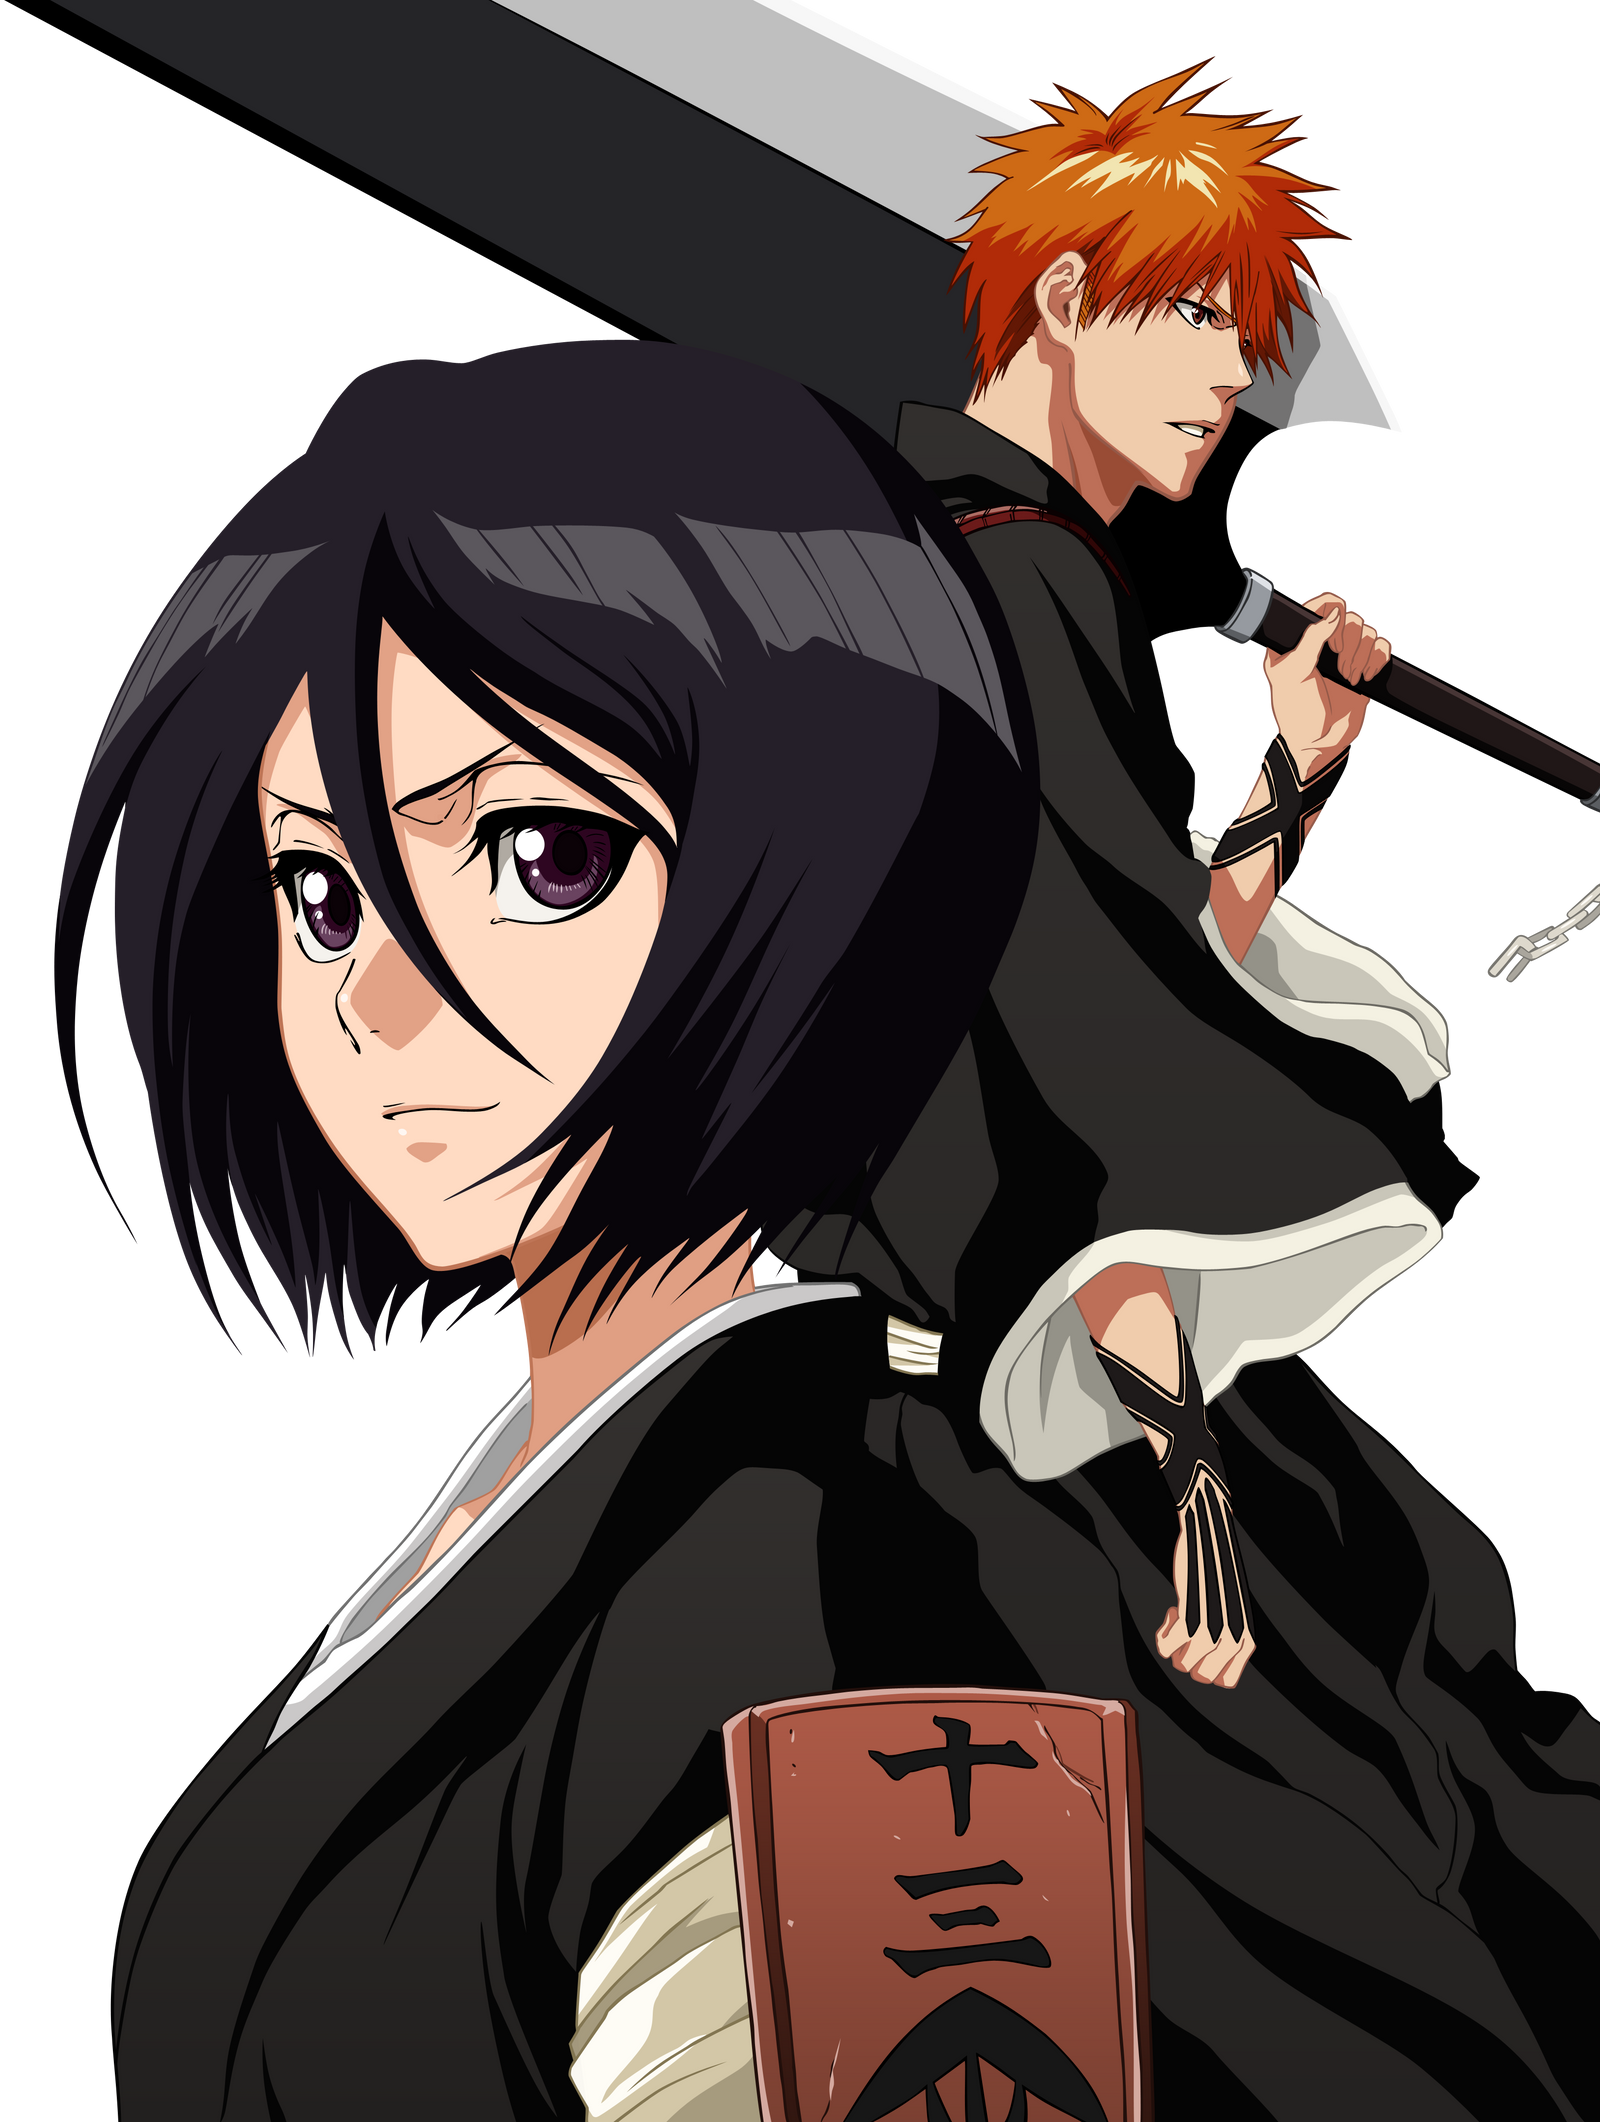 bleach manga rukia and ichigo relationship